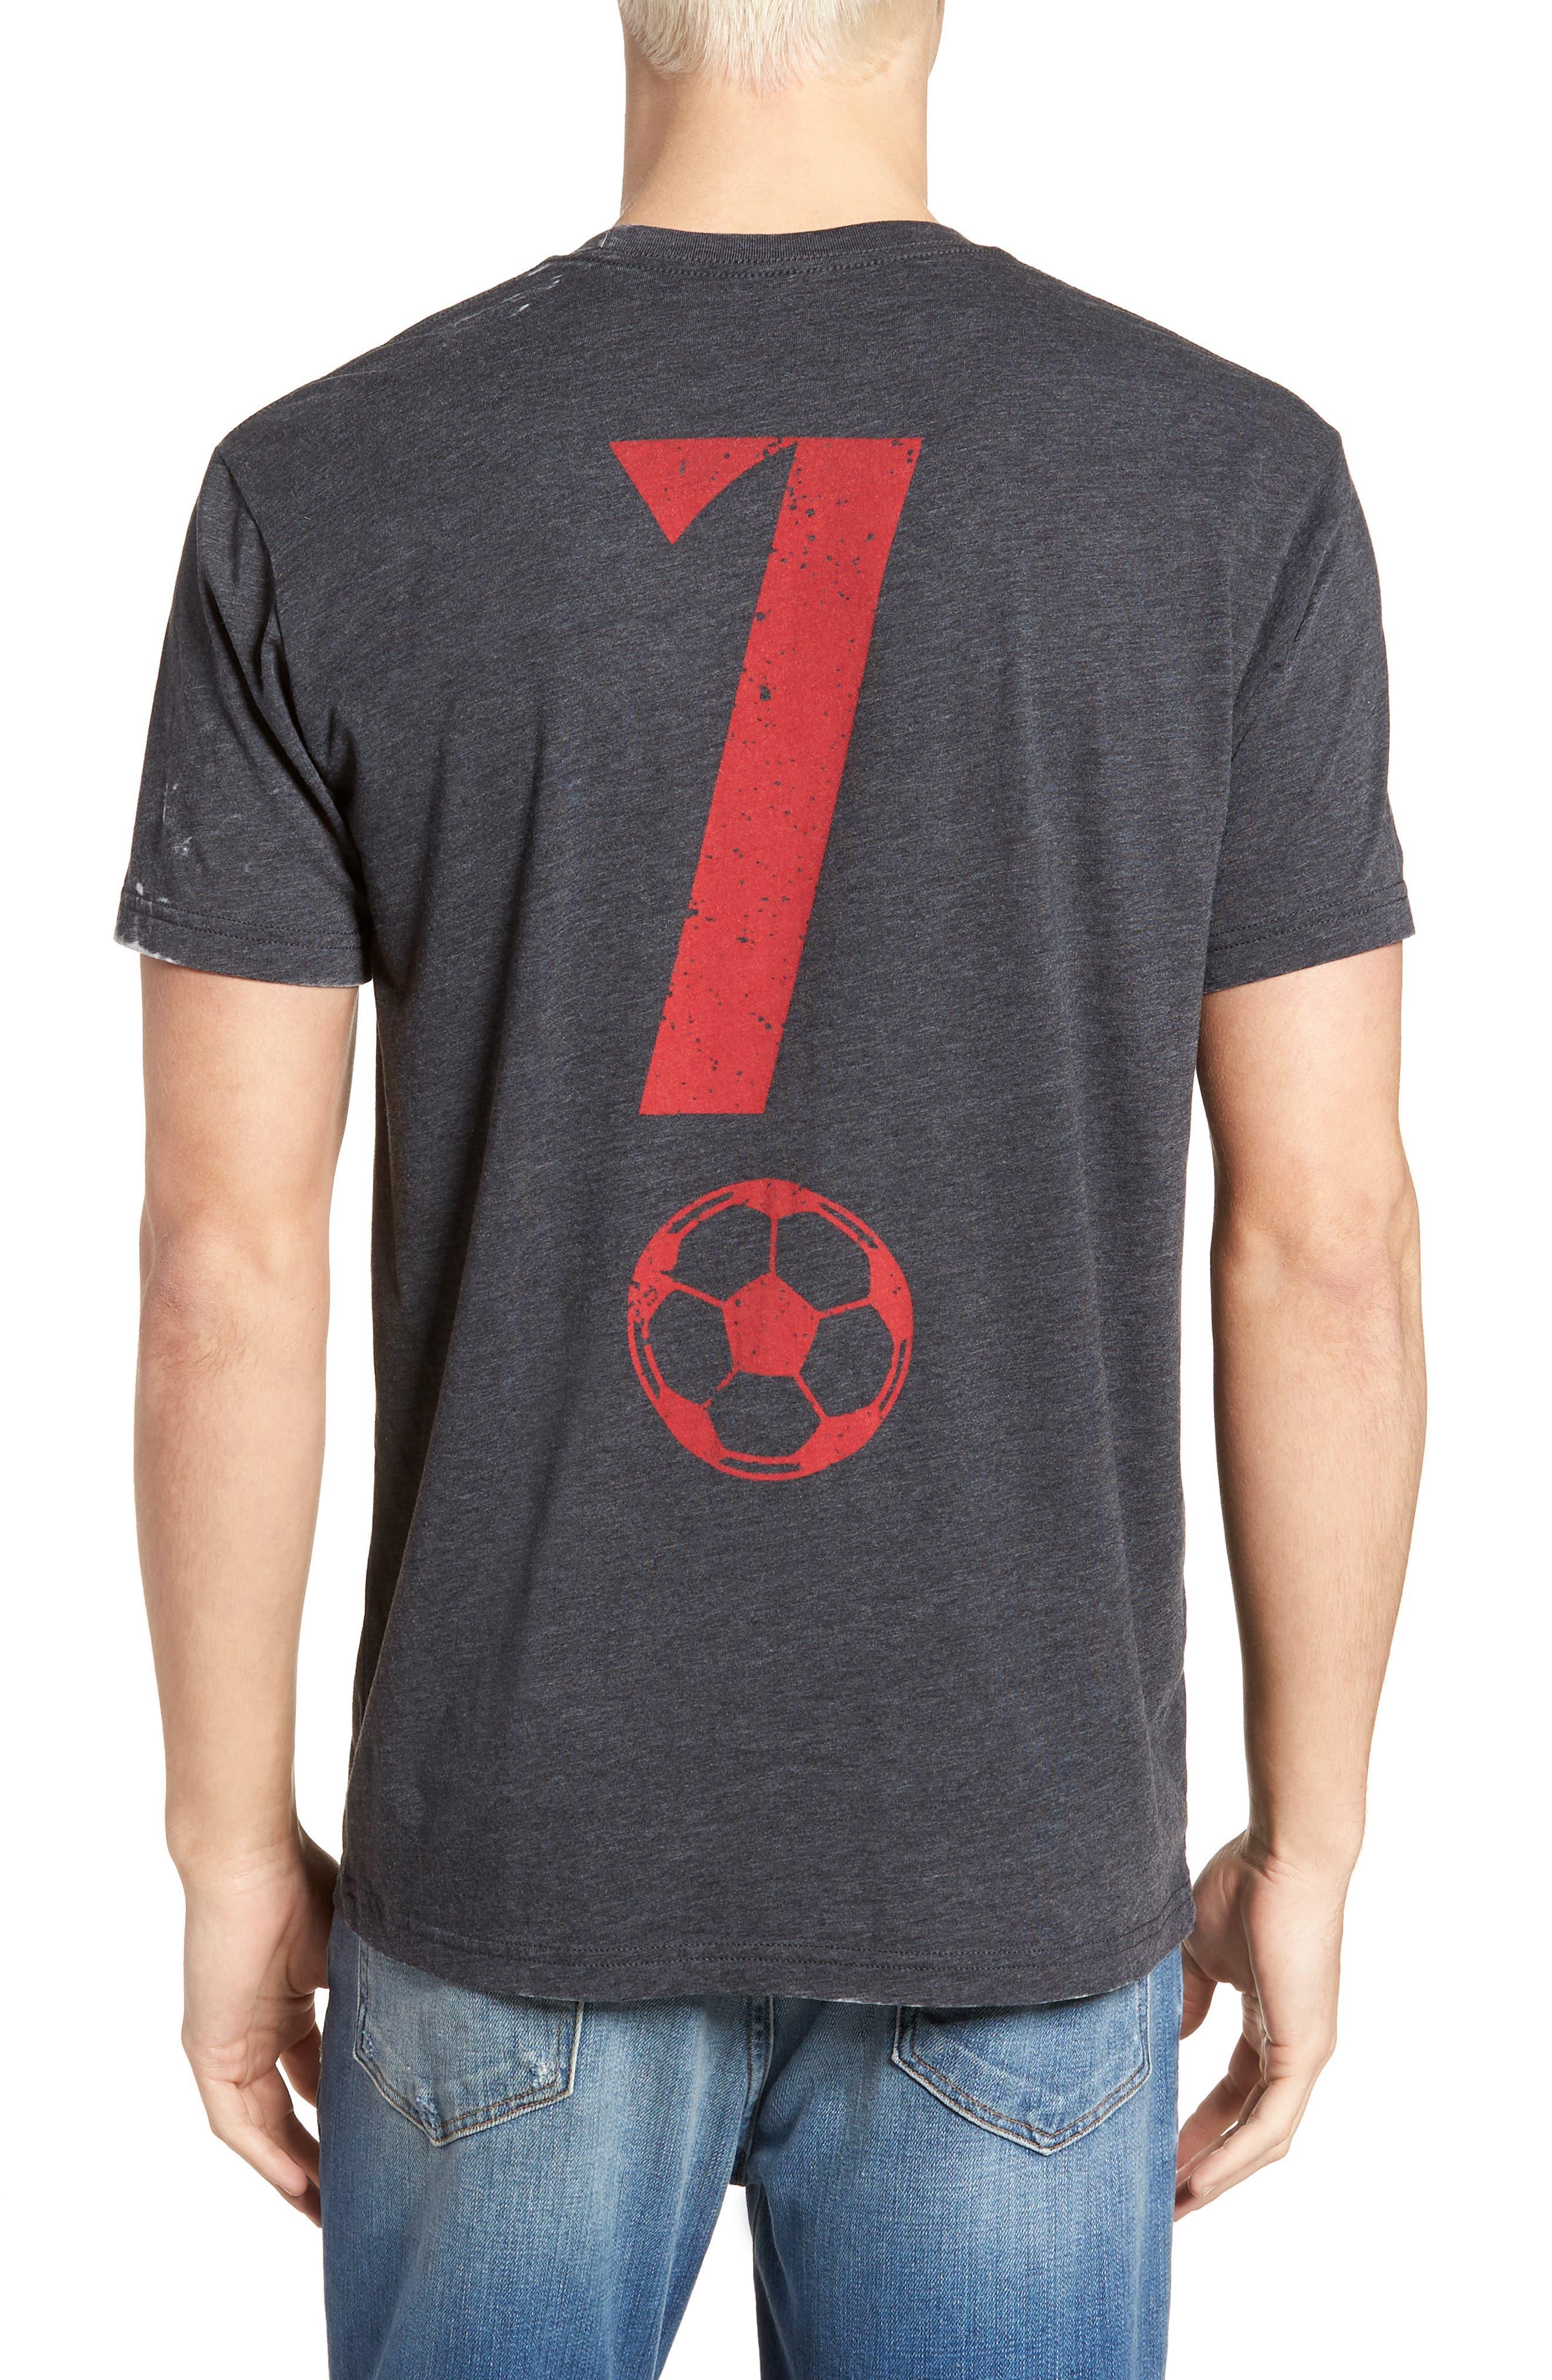 Portugal Jersey T-Shirt,                             Alternate thumbnail 2, color,                             020